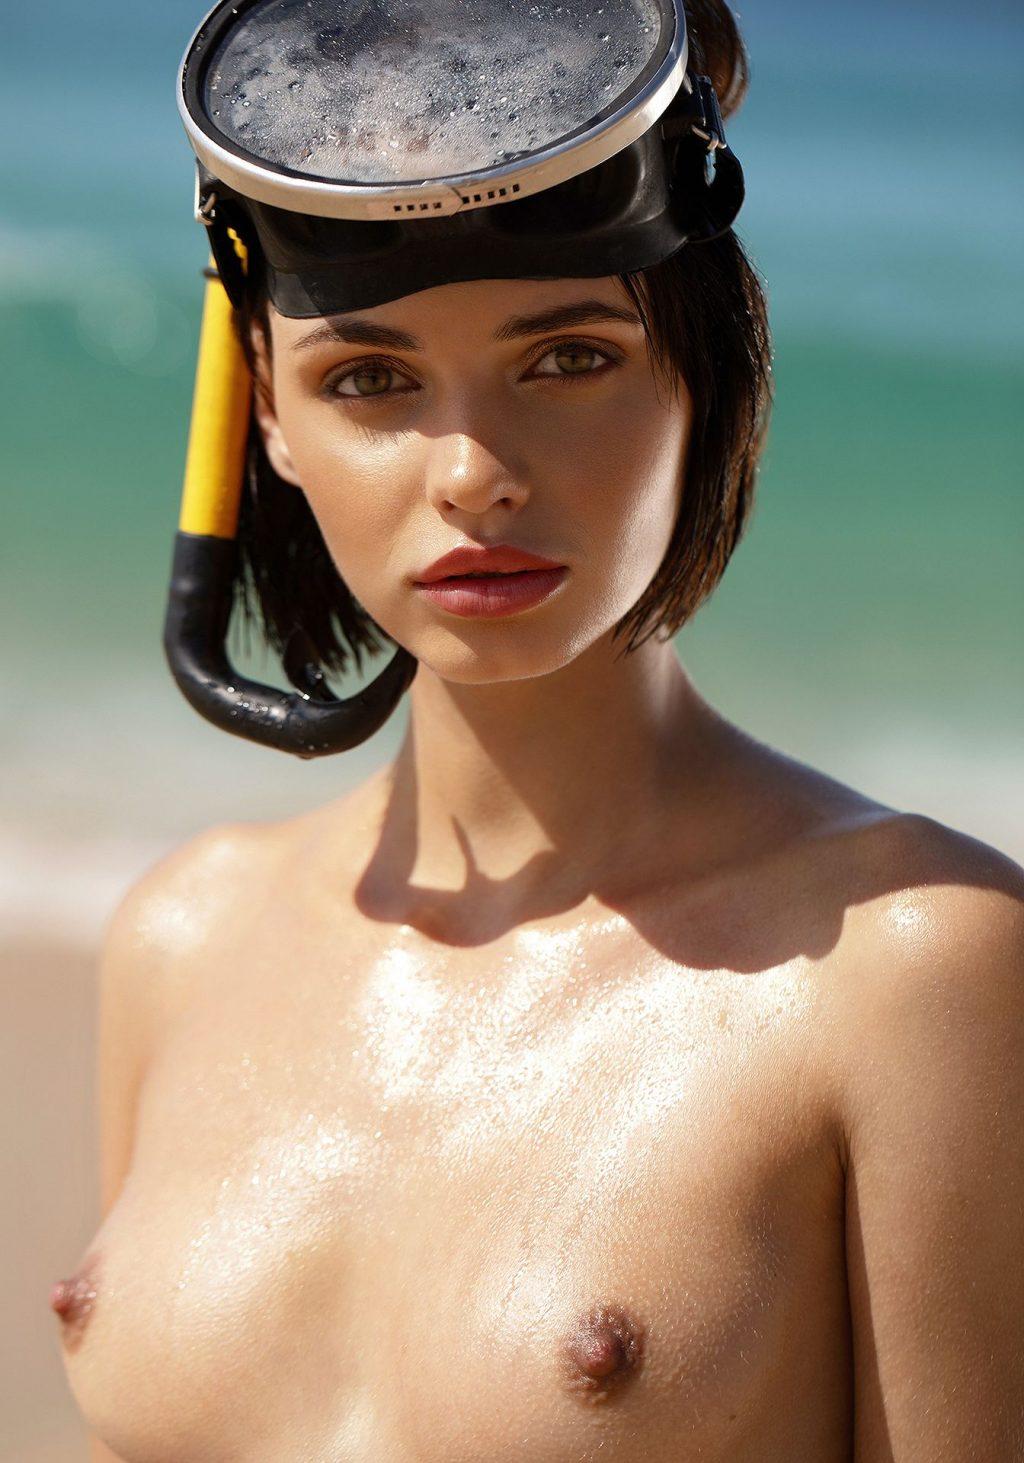 Ana Carolina Playboy natalia udovenko – ( ͡° ͜ʖ ͡°) |the fappening | frappening